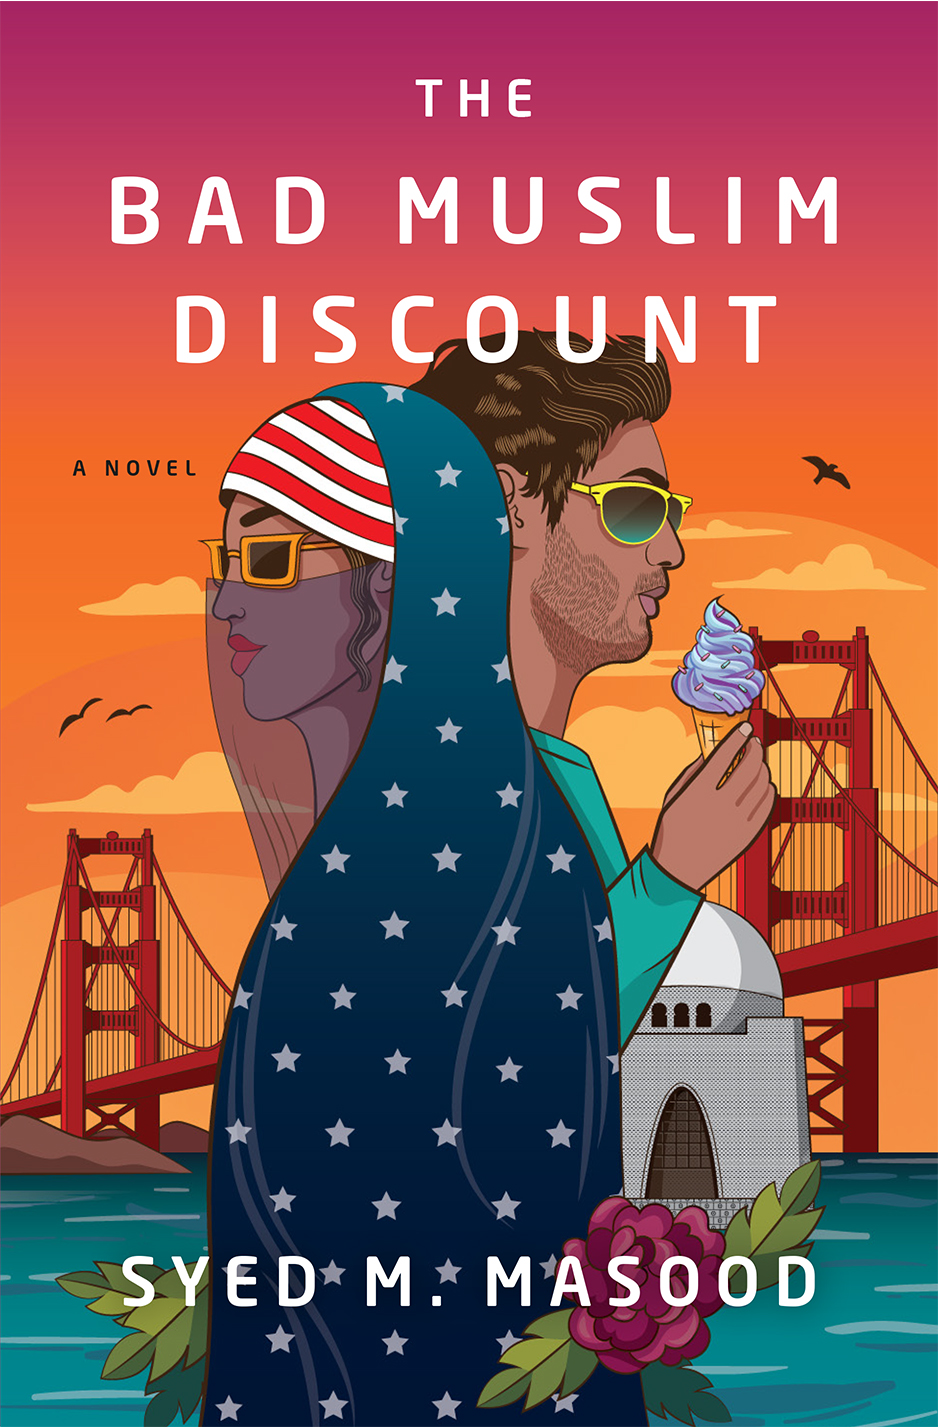 The Bad Muslim Discount - Syed M. Masood